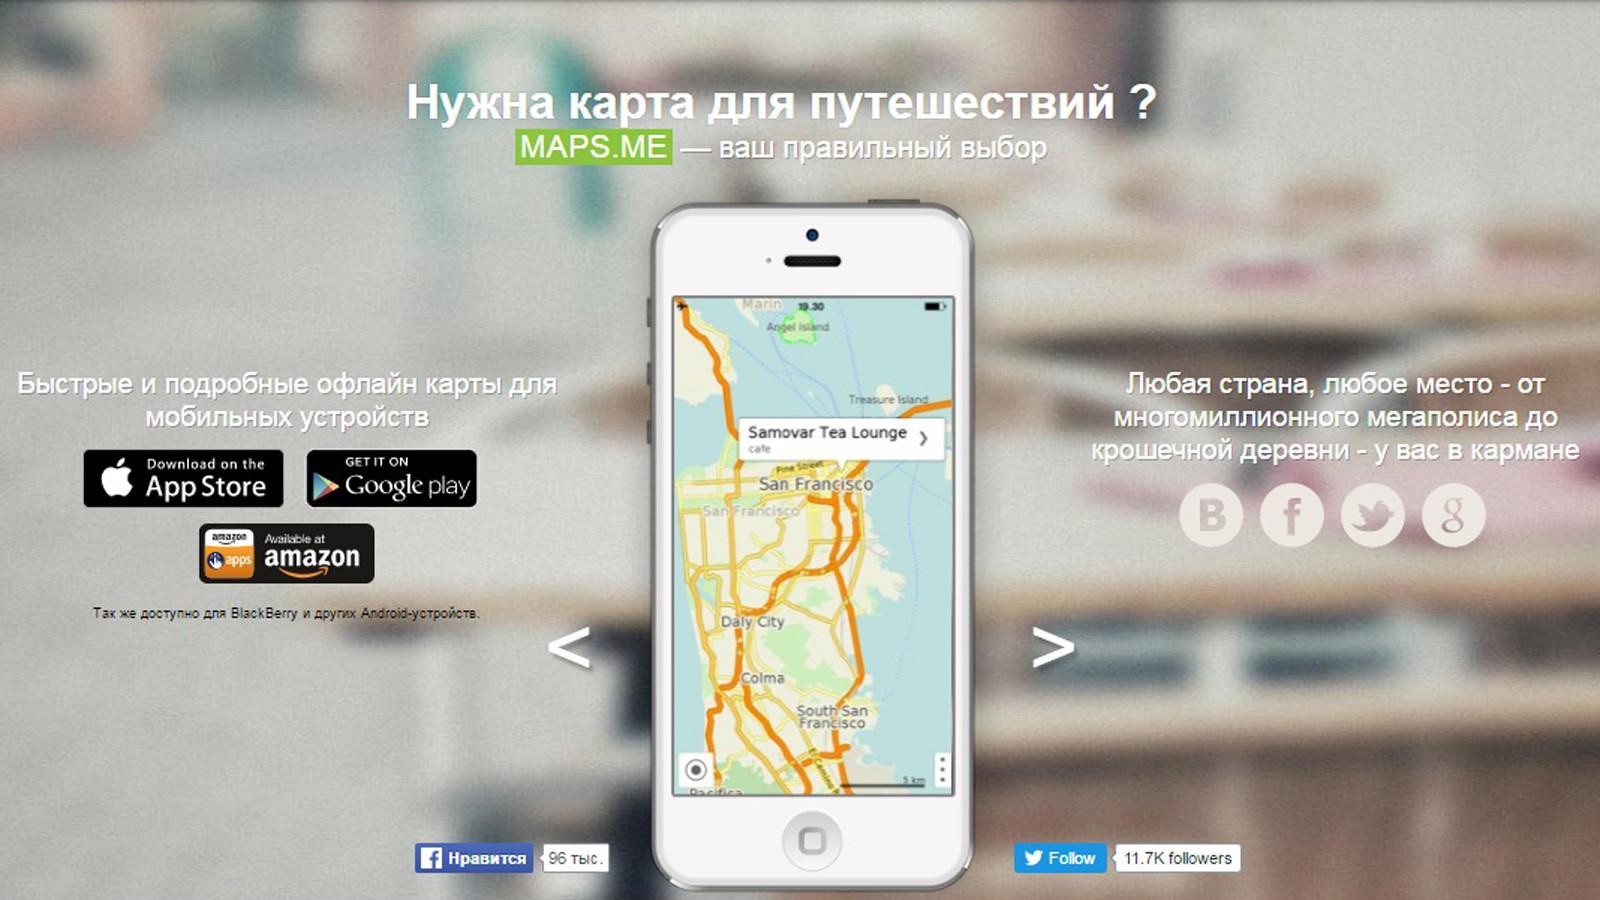 УЯндекс.Навигатора появится соперник отMail.ru Group